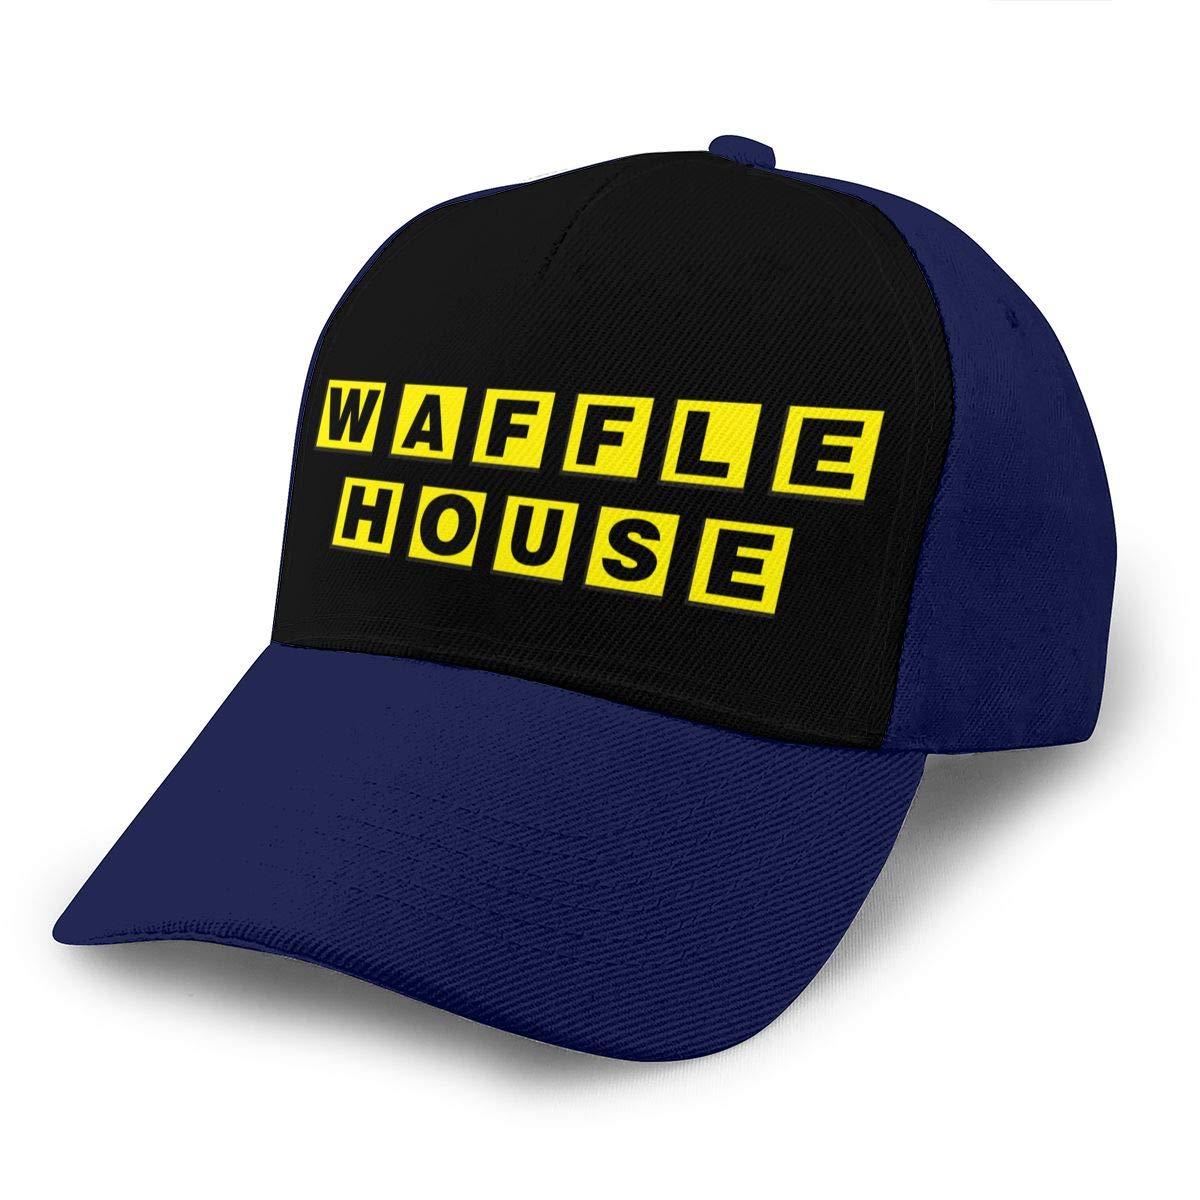 Adjustable Women Men Waffle-House-Logo Print Baseball Cap Flat Brim Cap Hats Hip Hop Snapback Sun Hat Boys Girls Navy by Apolonia